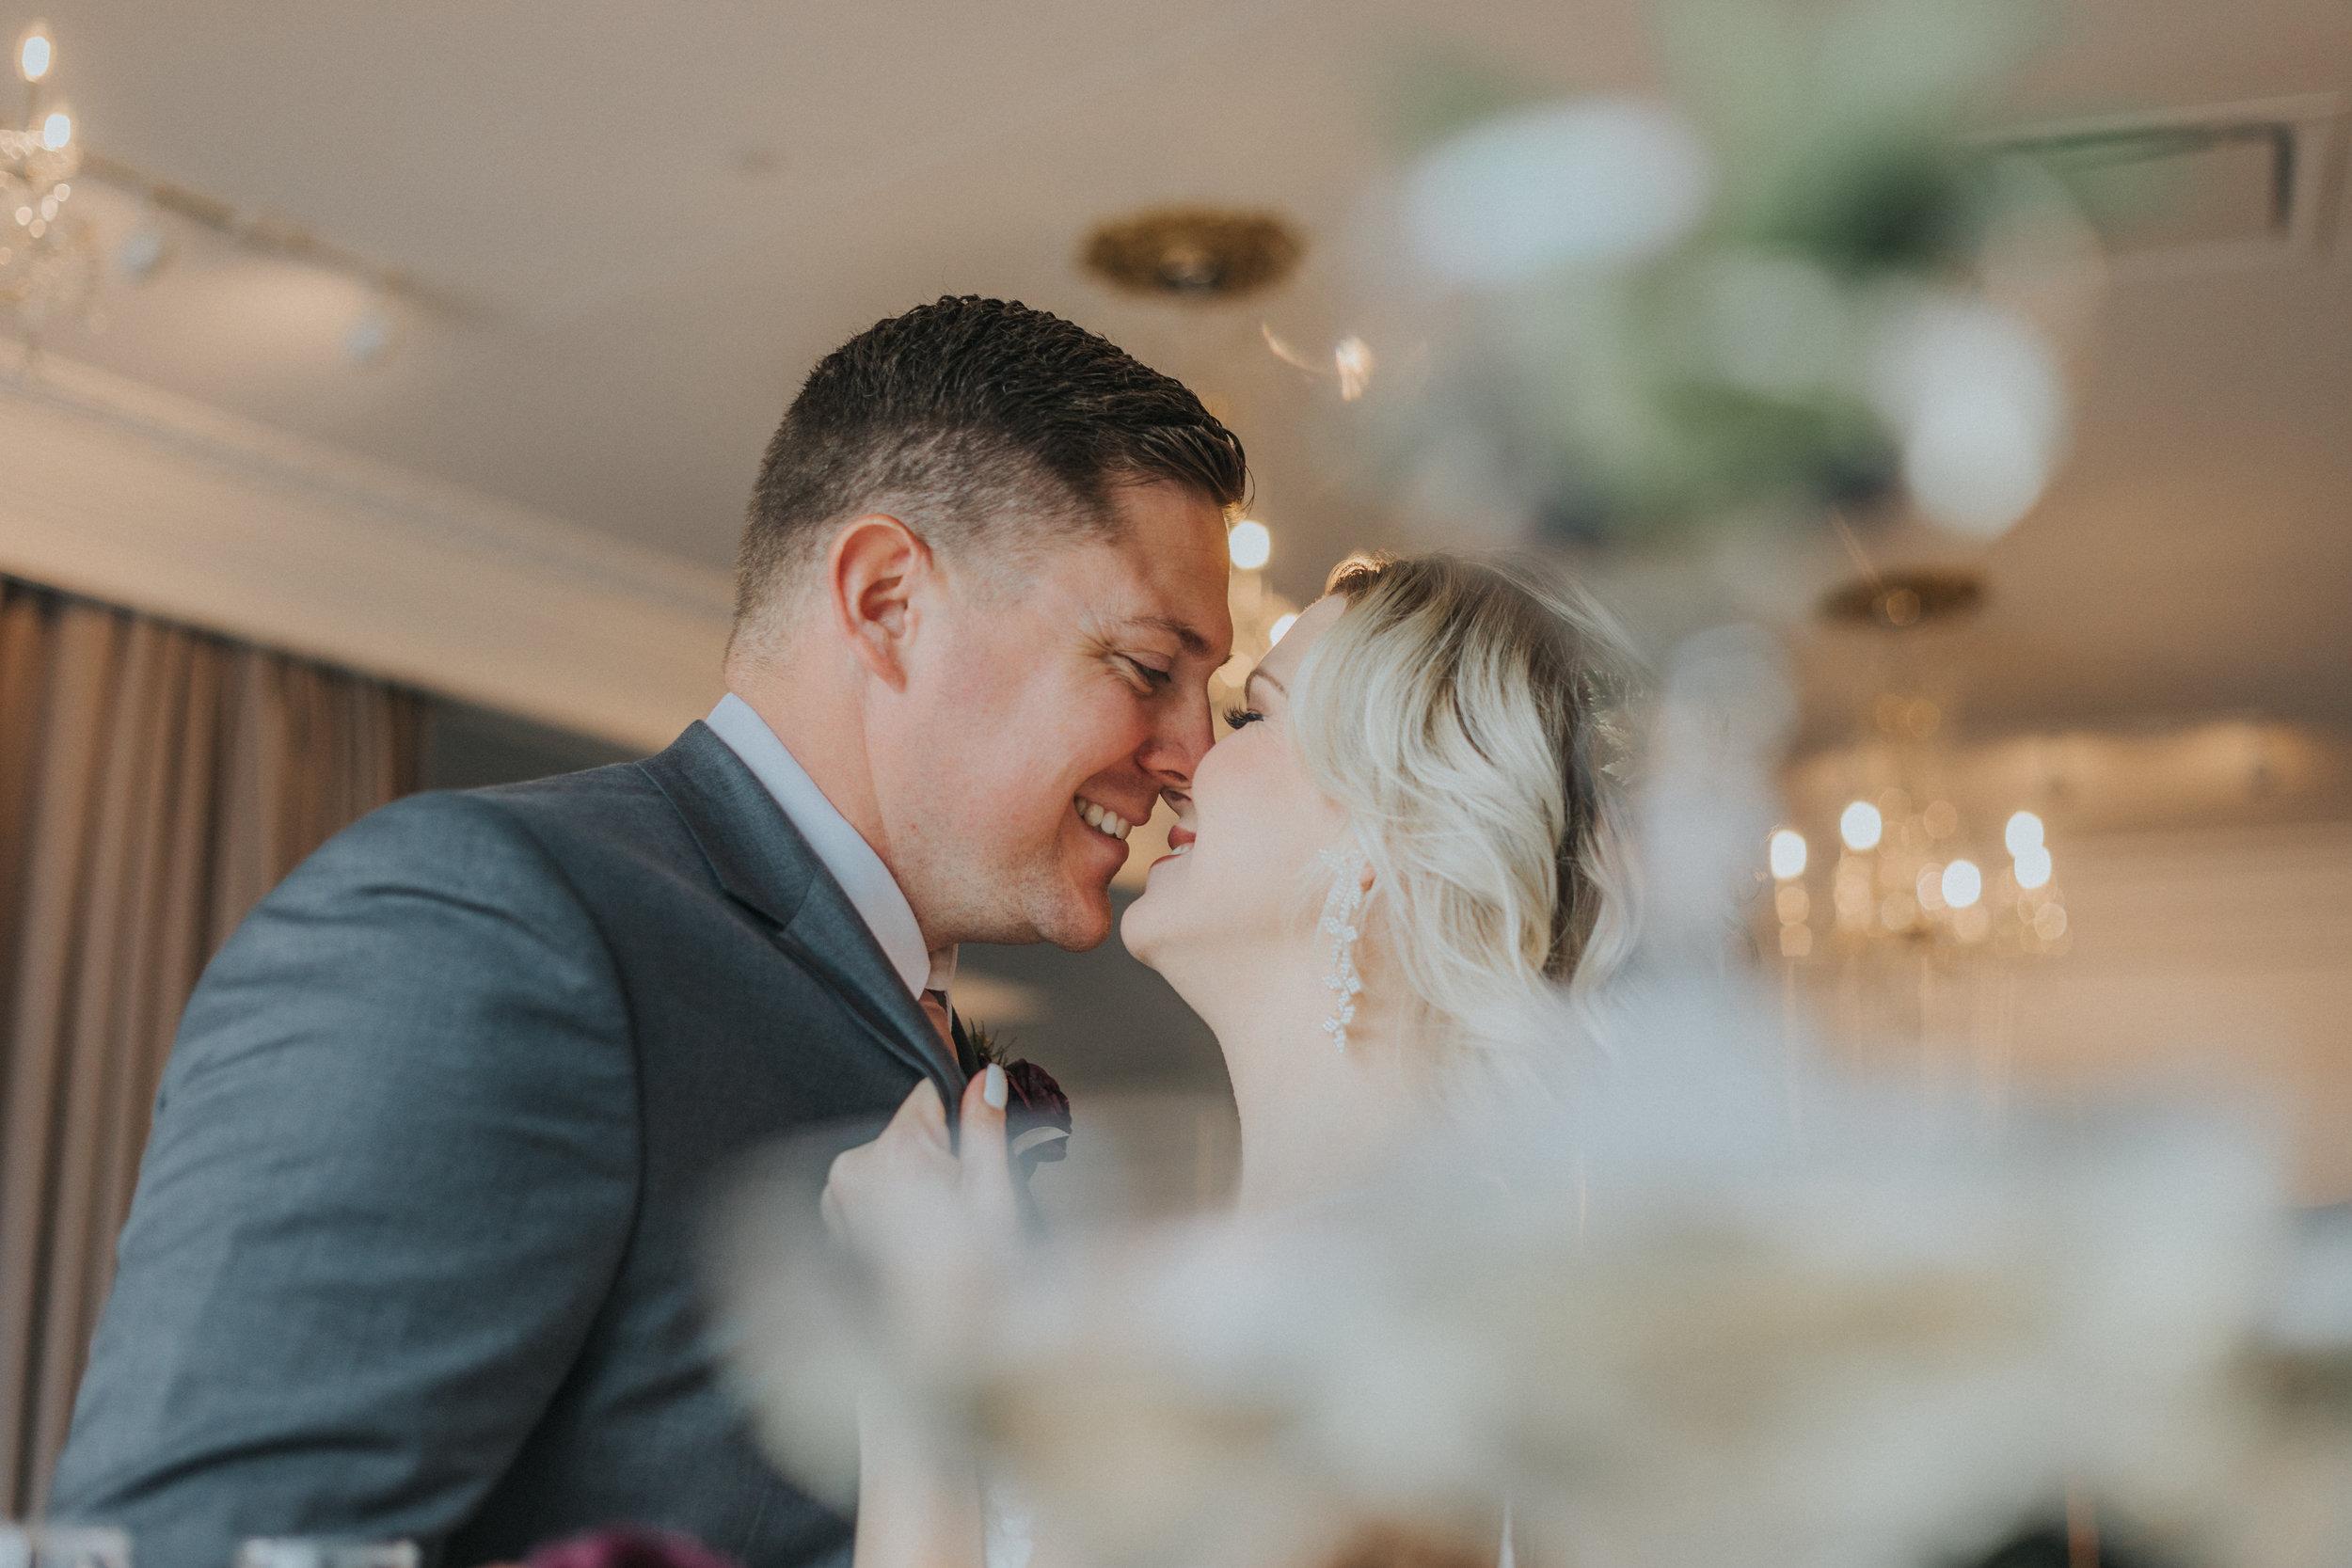 145 tiny-luxe-weddings-omaha-nebraska-midwest-empire-room.jpg